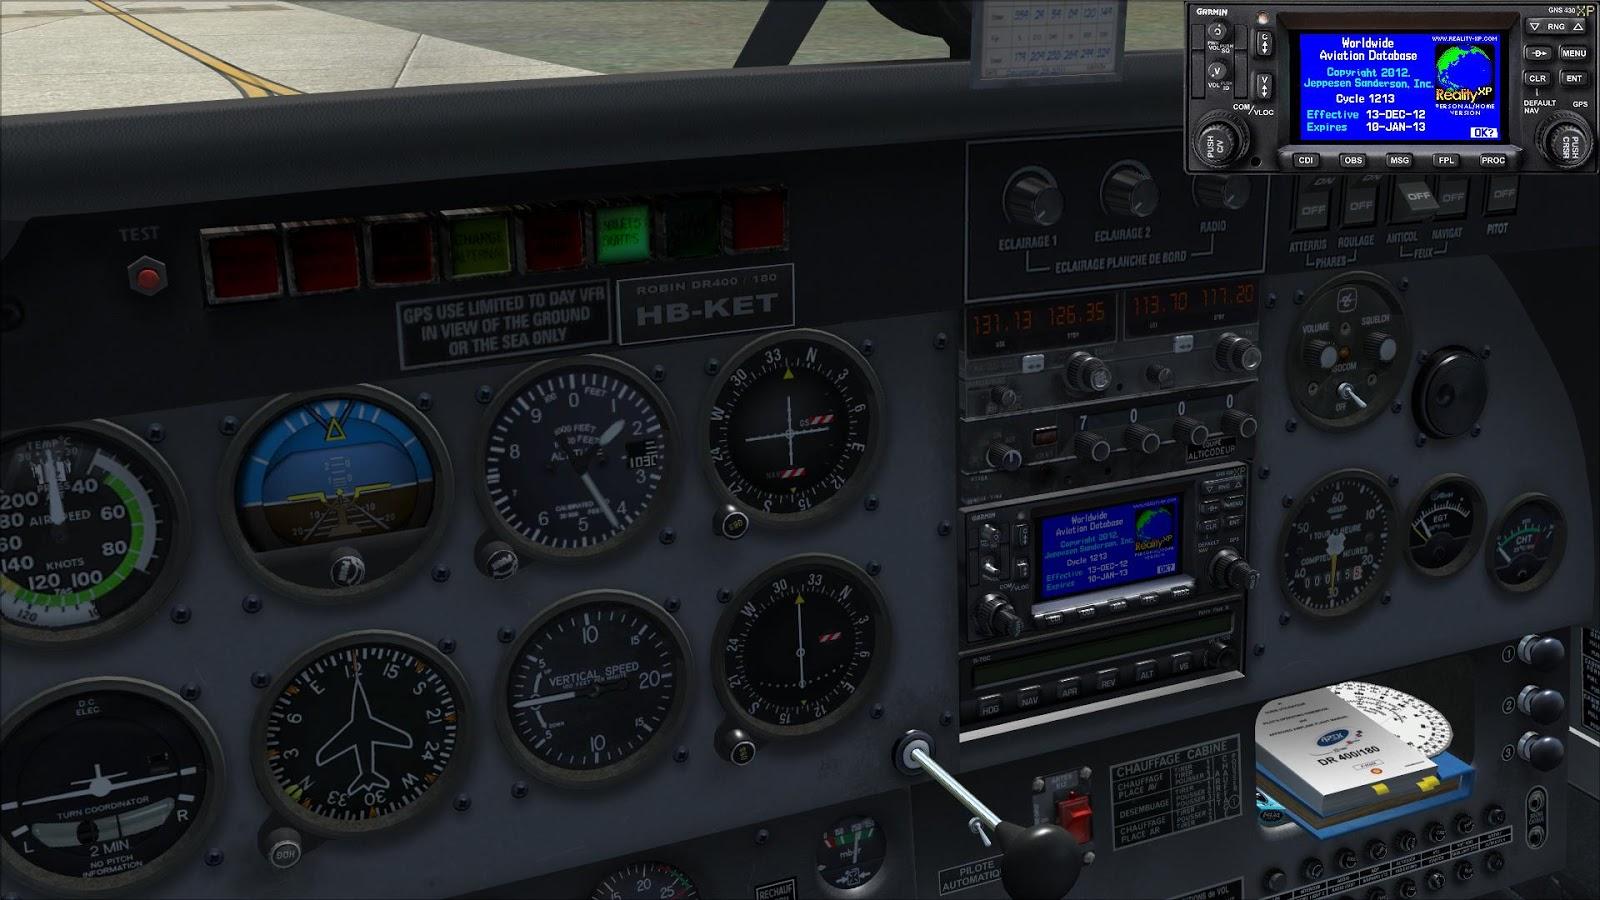 Petit Pilote Loisir: Garmin GNS430 WAAS de RealityXP